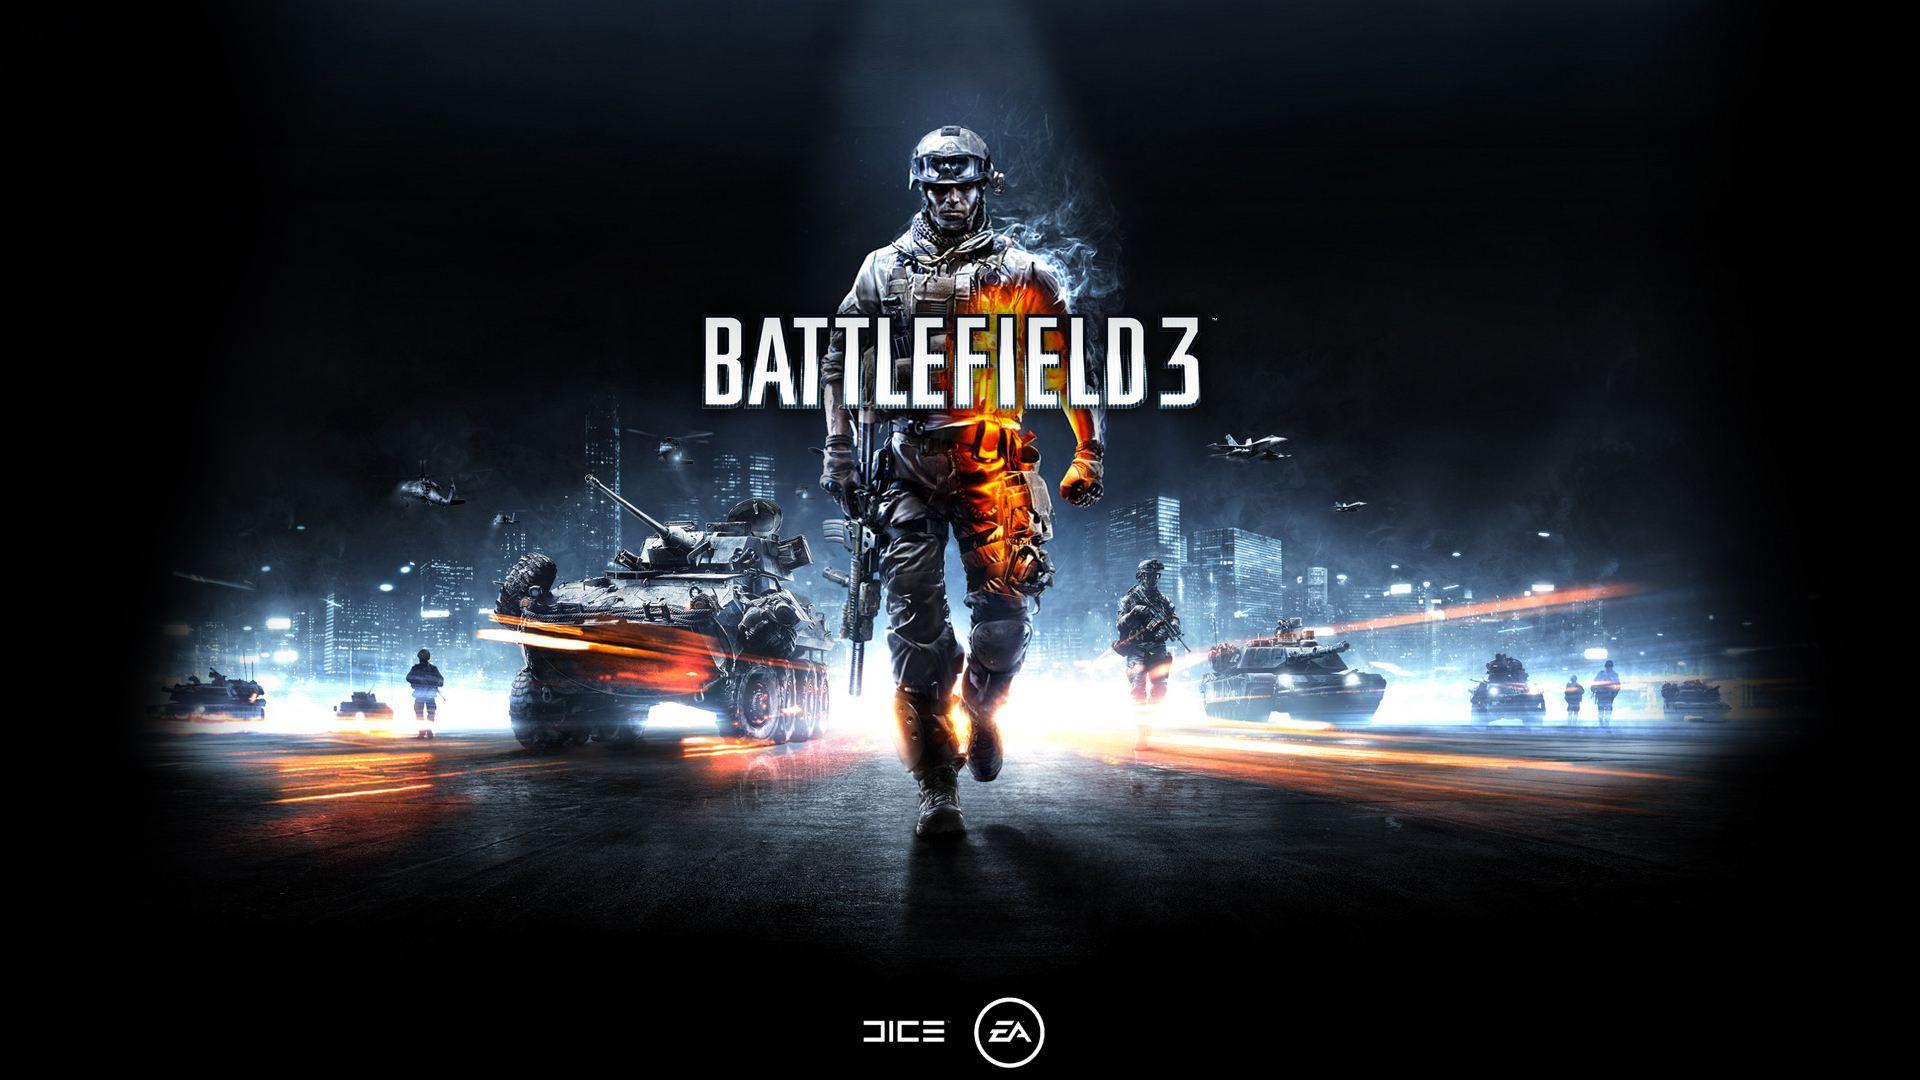 Battlefield 3 do pobrania za darmo